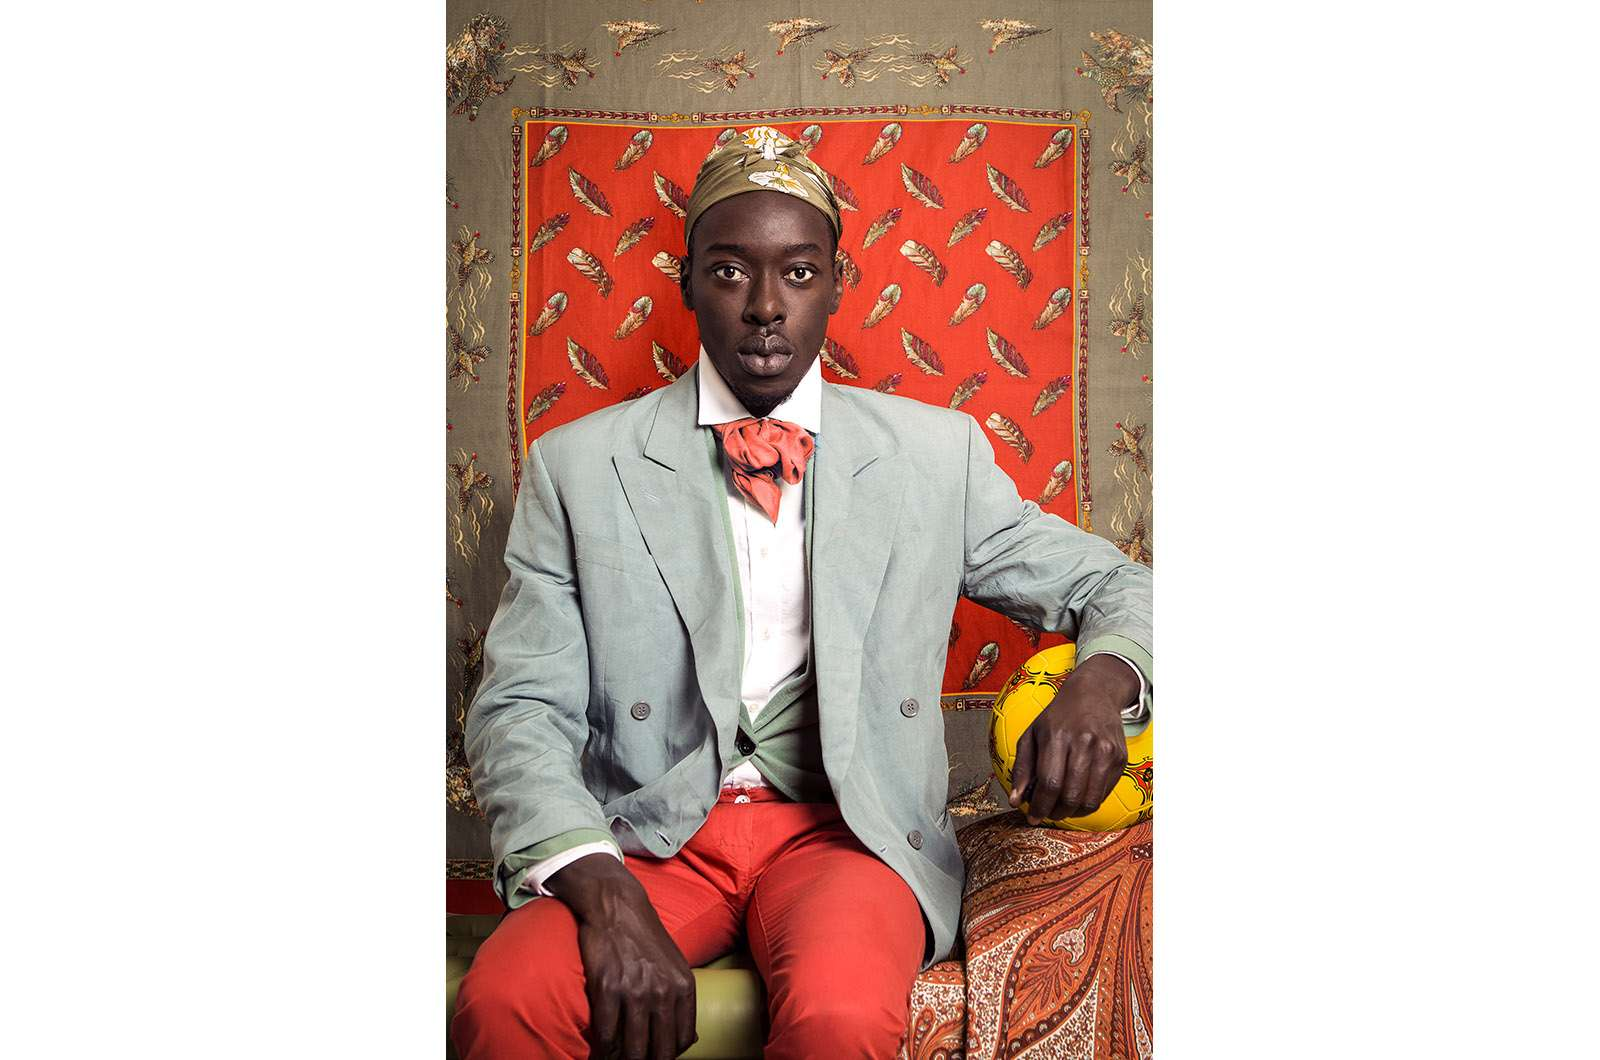 Omar Victor Diop, Omar Ibn Said, 2015. Série Diaspora Impression jet d'encre pigmentaire sur papier Harman By Hahnemuhle. © Omar Victor Diop. Courtesy Galerie MAGNIN-A, Paris.